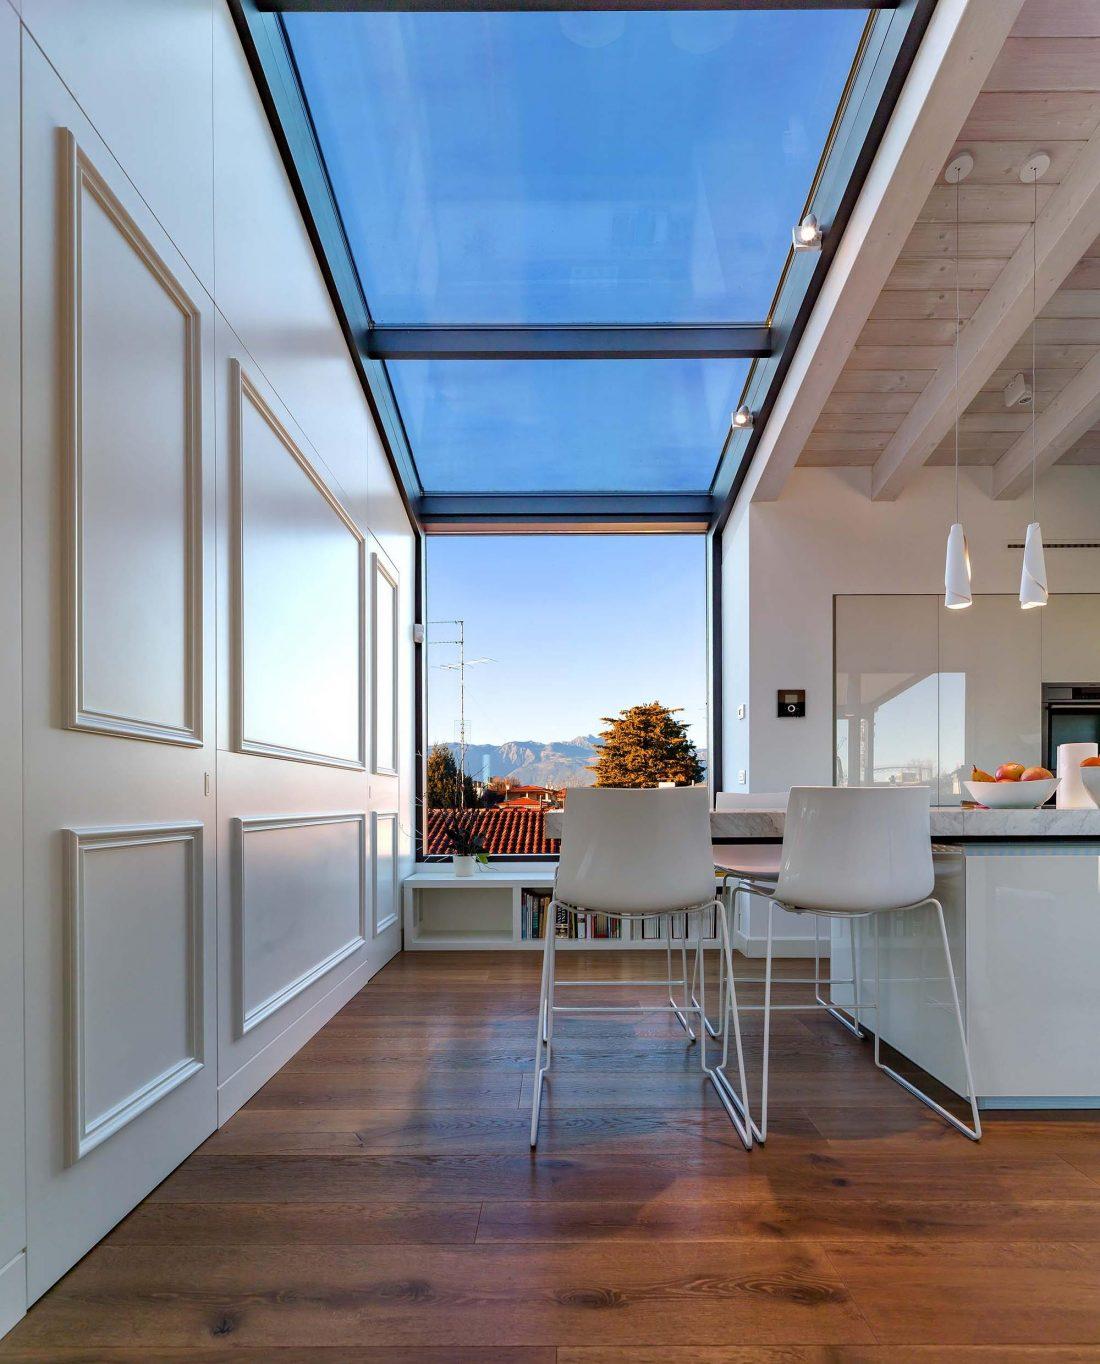 Дом в Порденоне, Италия, от студии Caprioglio Associati Architects 30